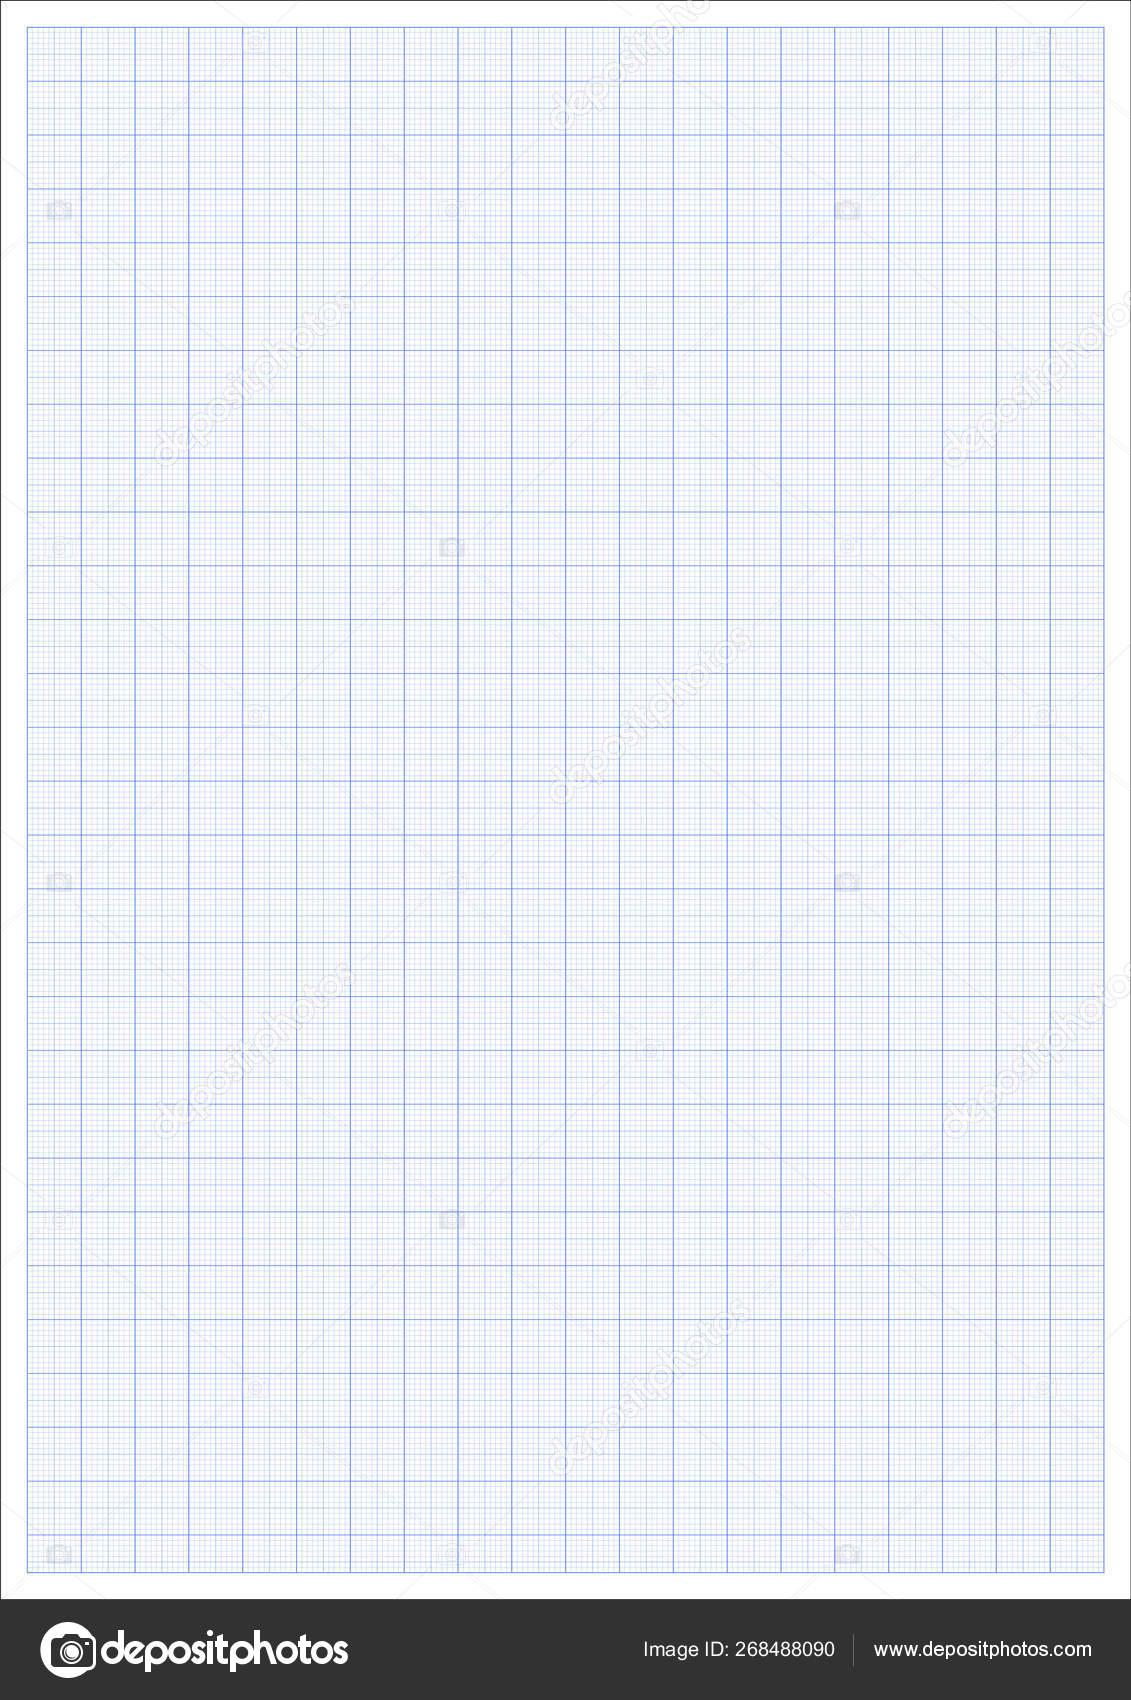 millimeter paper millimeterpapier grid